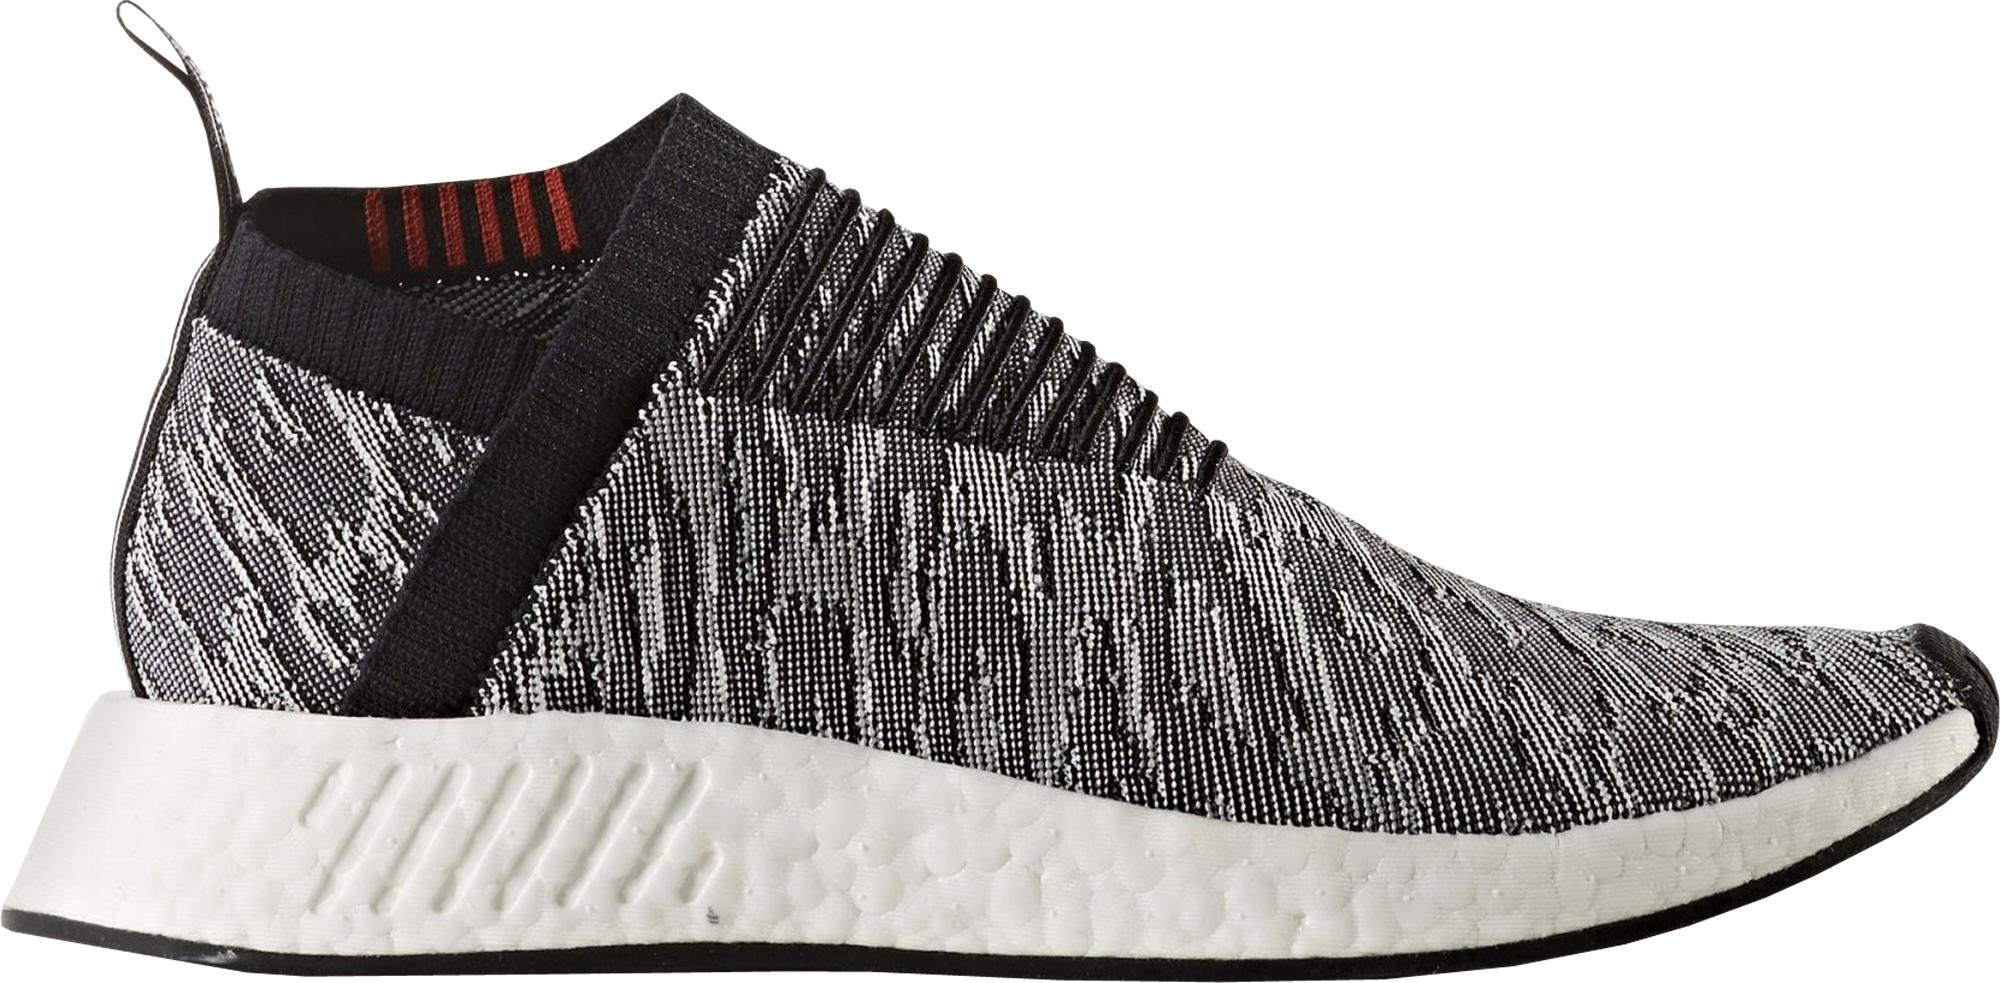 Adidas Nmd Cs2 Glitch Black Red White Stockx News